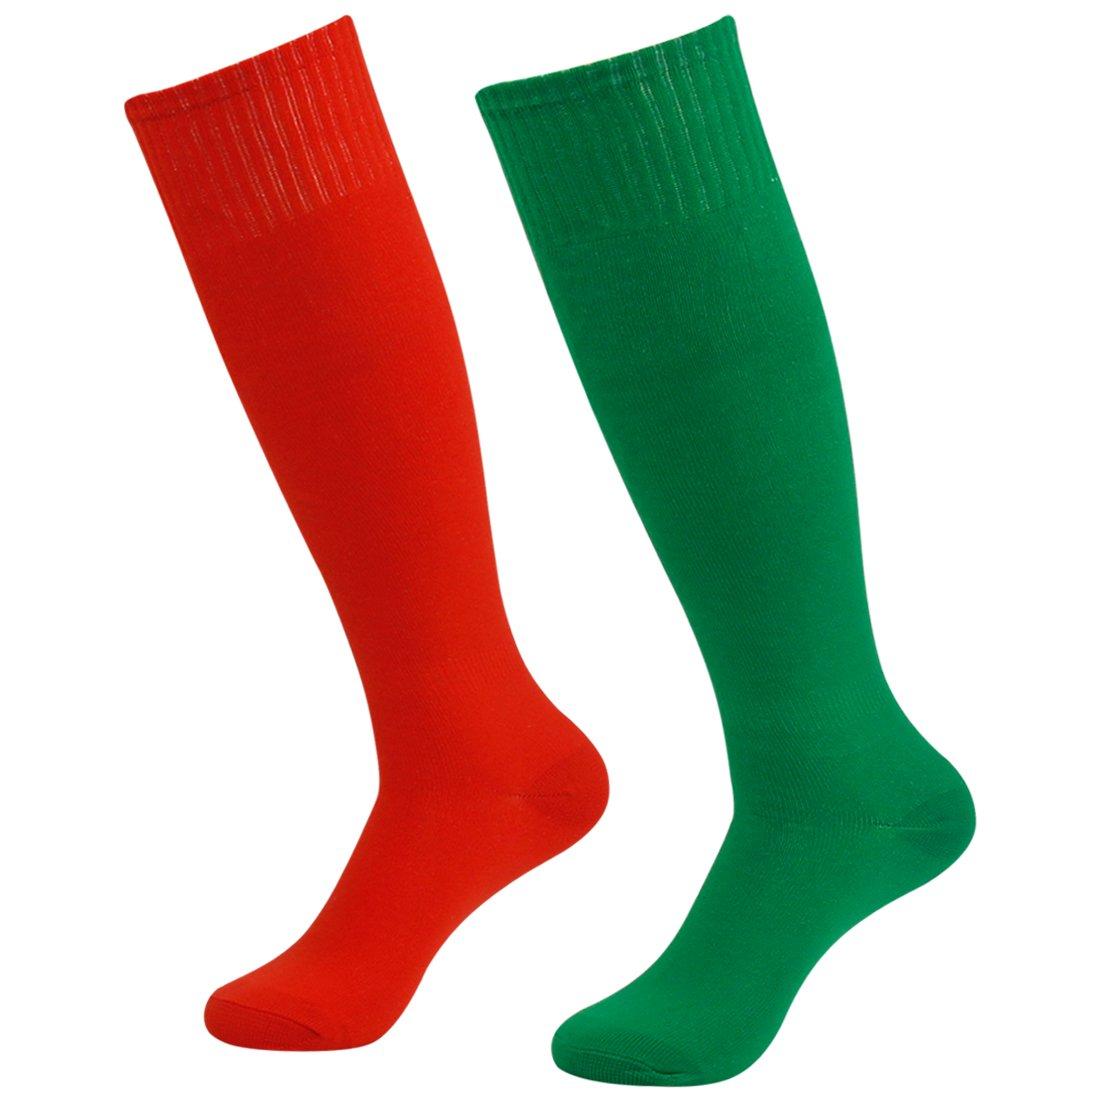 Fasoar Men's Women's Comfort Fancy Design Knee High Socks Soccer Socks Pack of 2 Red Green  2 pack red green  One Size by Fasoar